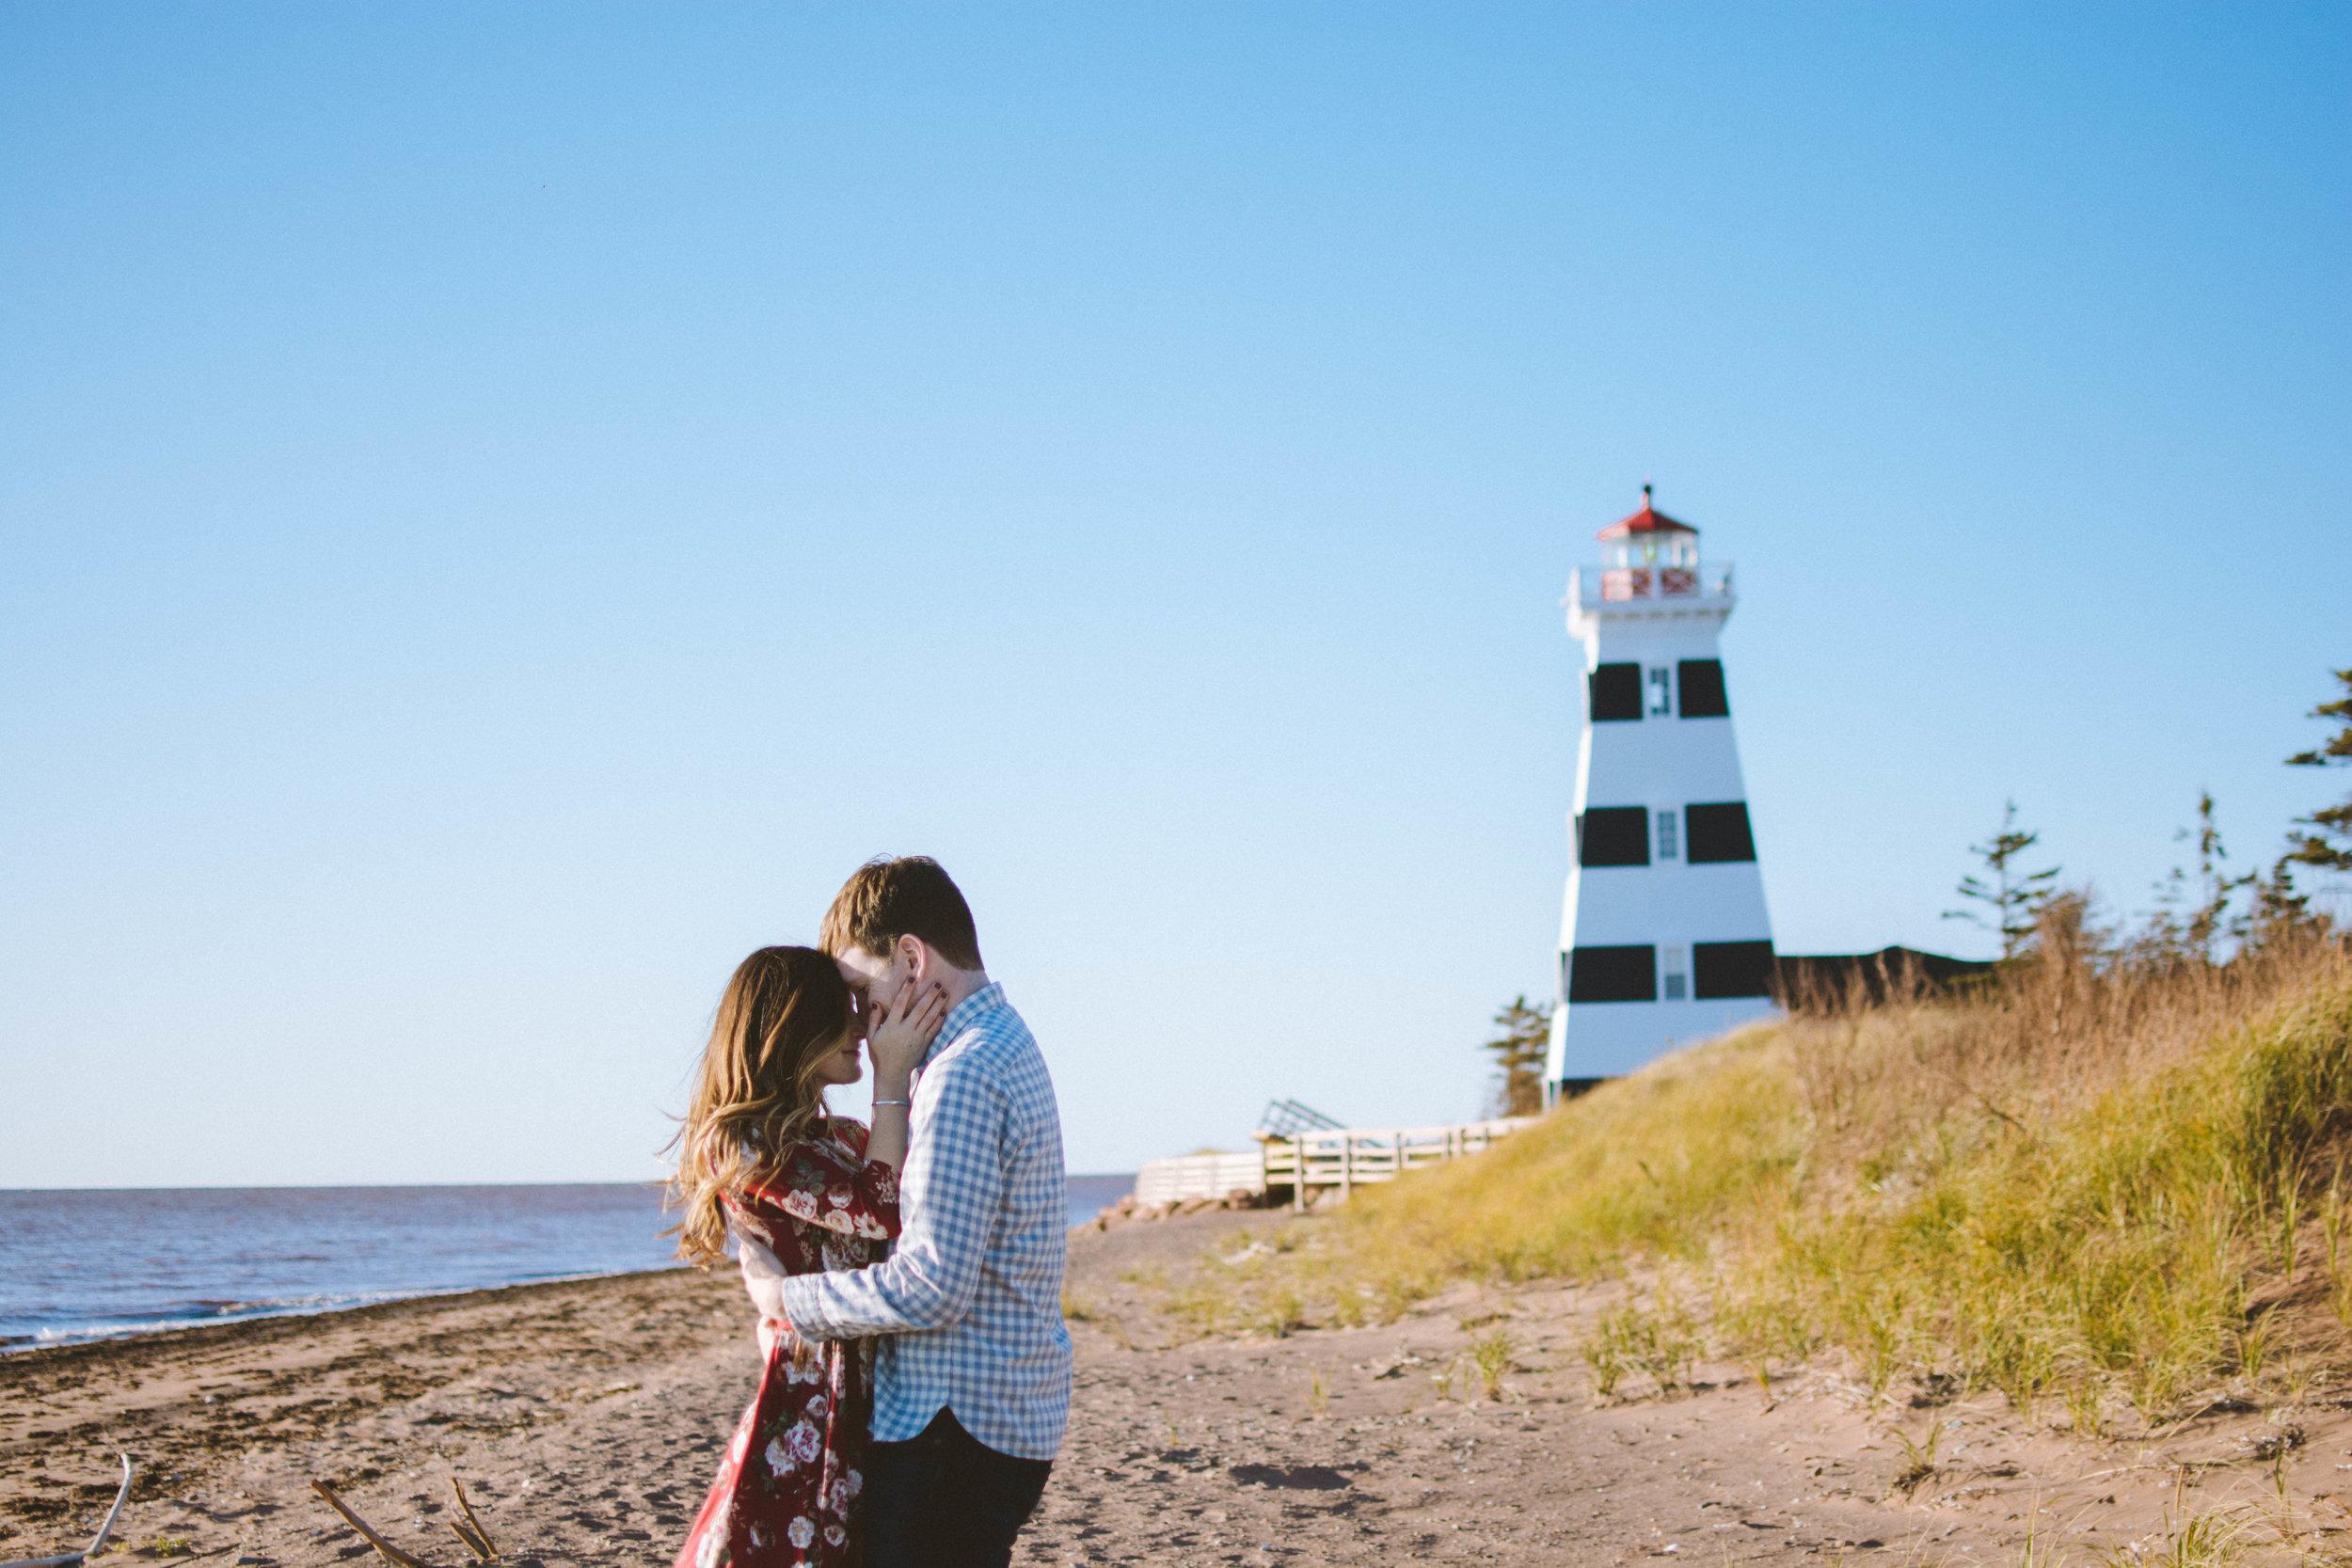 Prince Edward Island - West Point Lighthouse